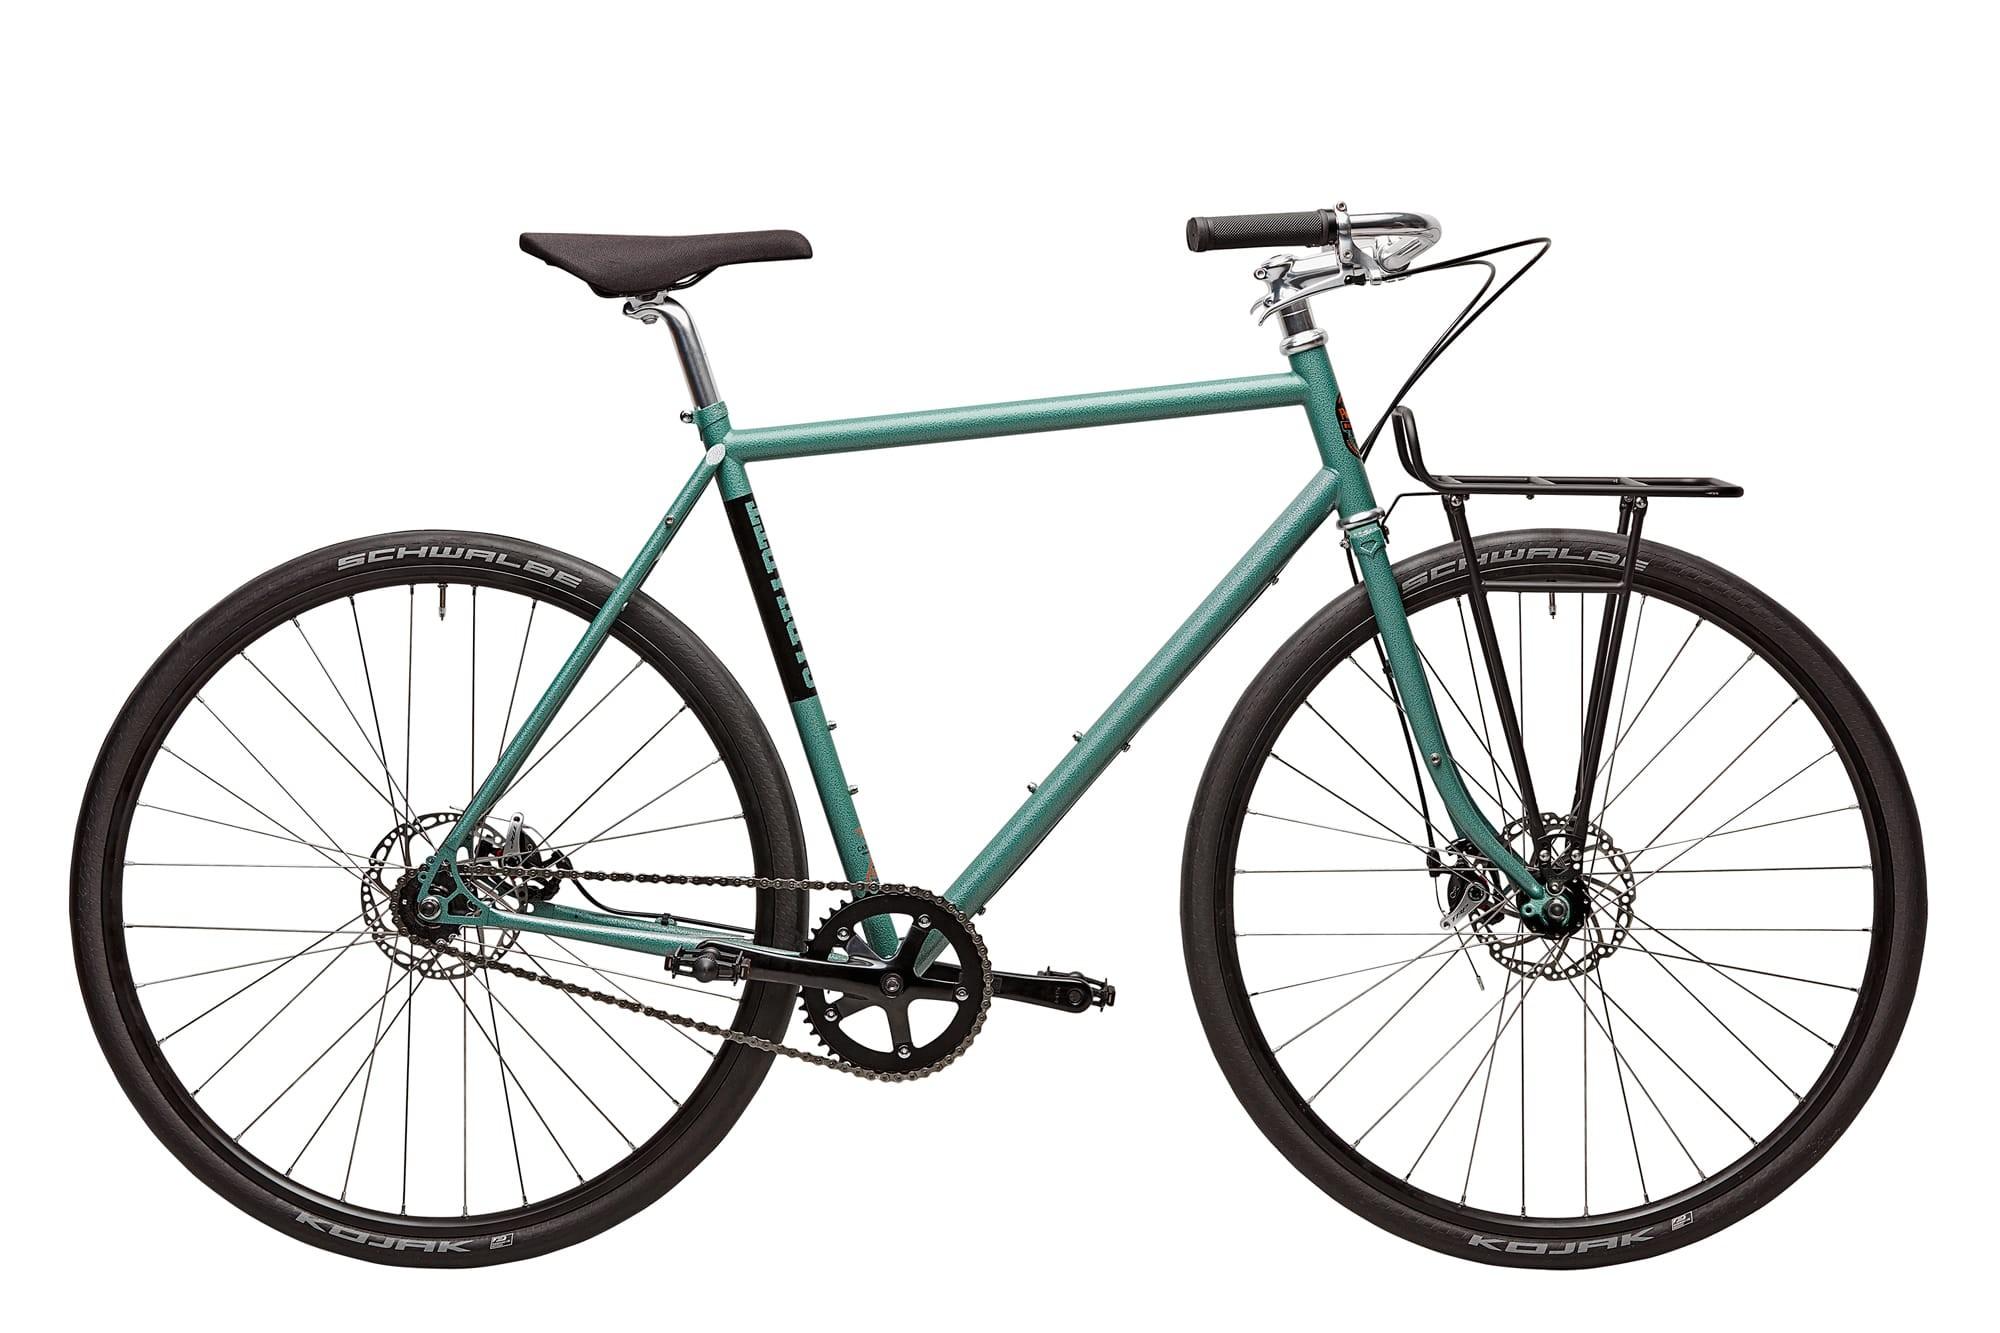 01_fw16_bike_details_1